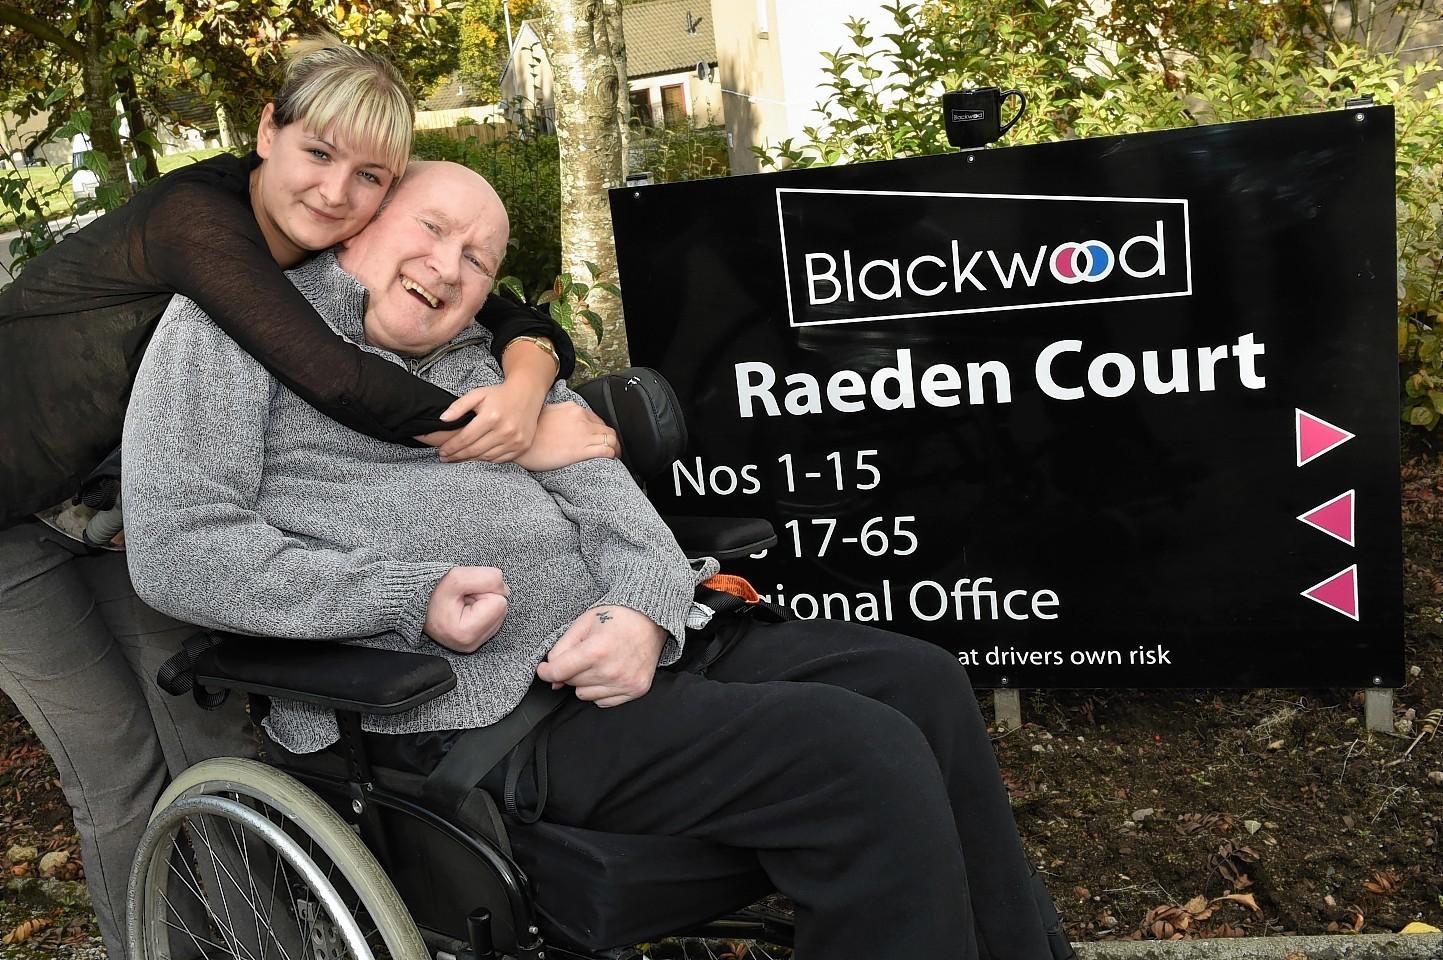 Blackwood Care Home in Raeder Court, Aberdeen